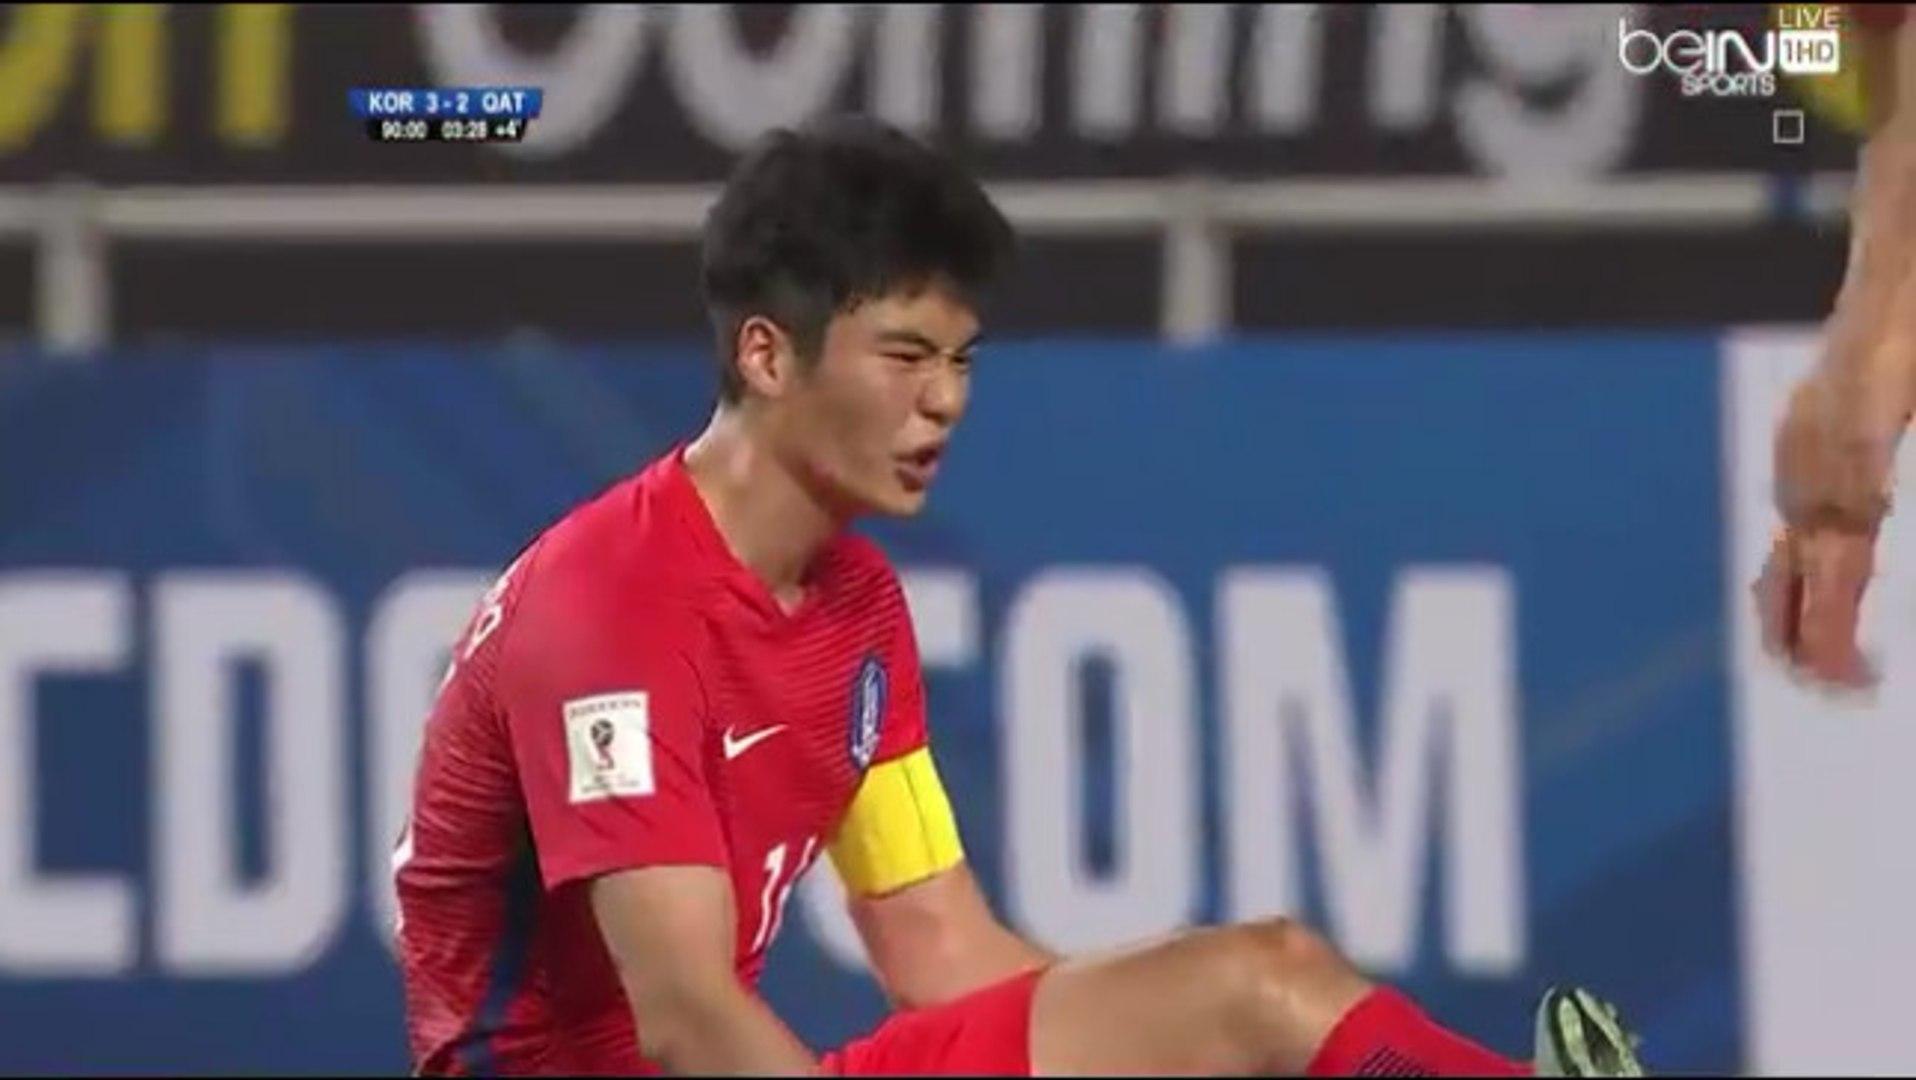 South Korea 3-2 Qatar - All Goals Exclusive (06/10/2016)